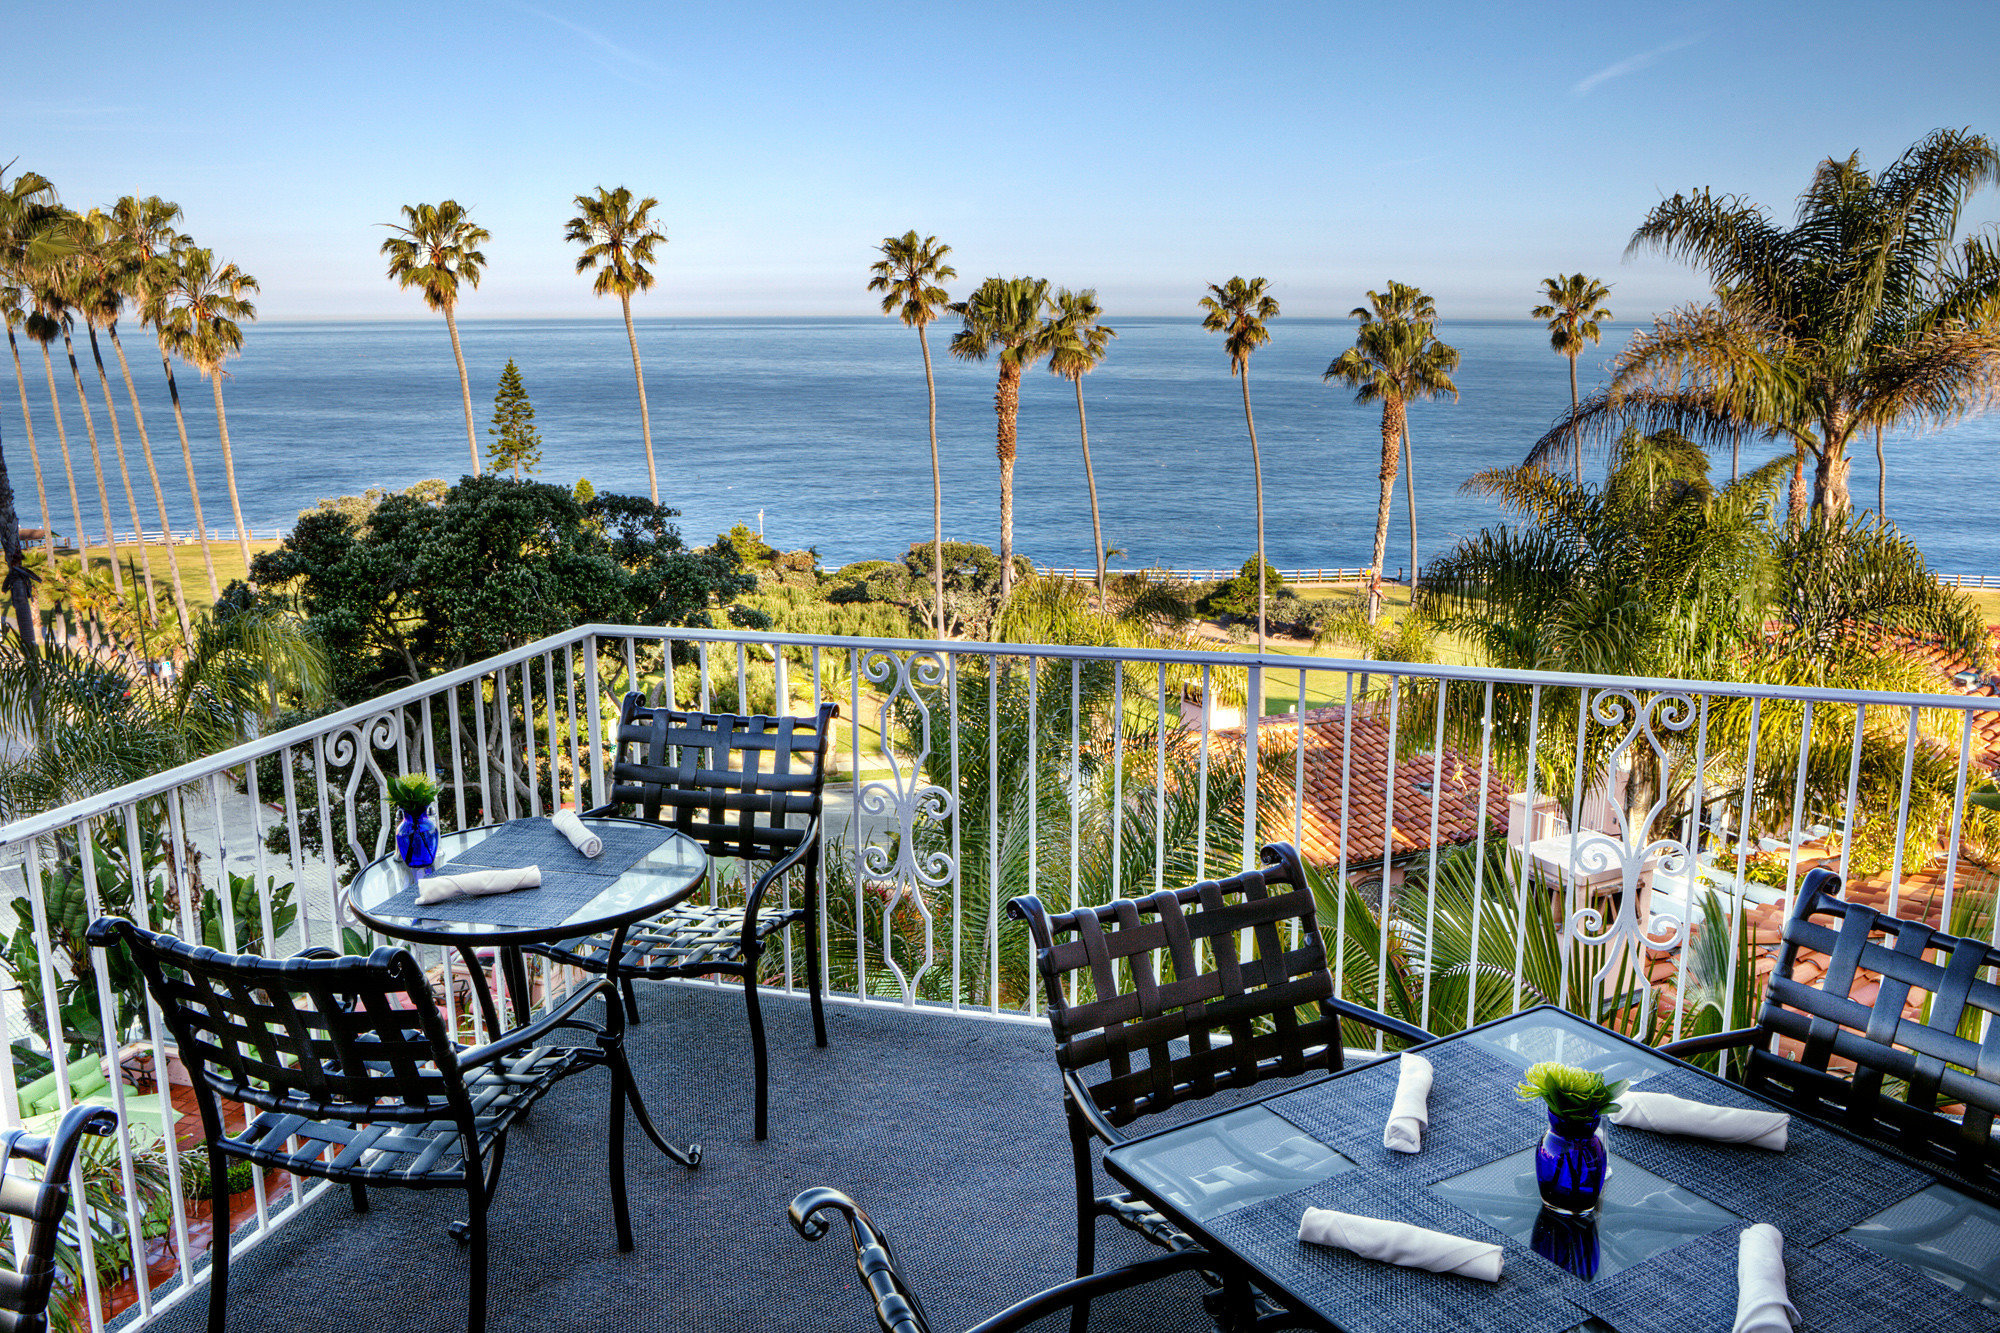 Balcony Dining Drink Eat Elegant Hotels Luxury Ocean Scenic views Terrace Tropical sky Fence leisure Deck park backyard Resort porch walkway overlooking